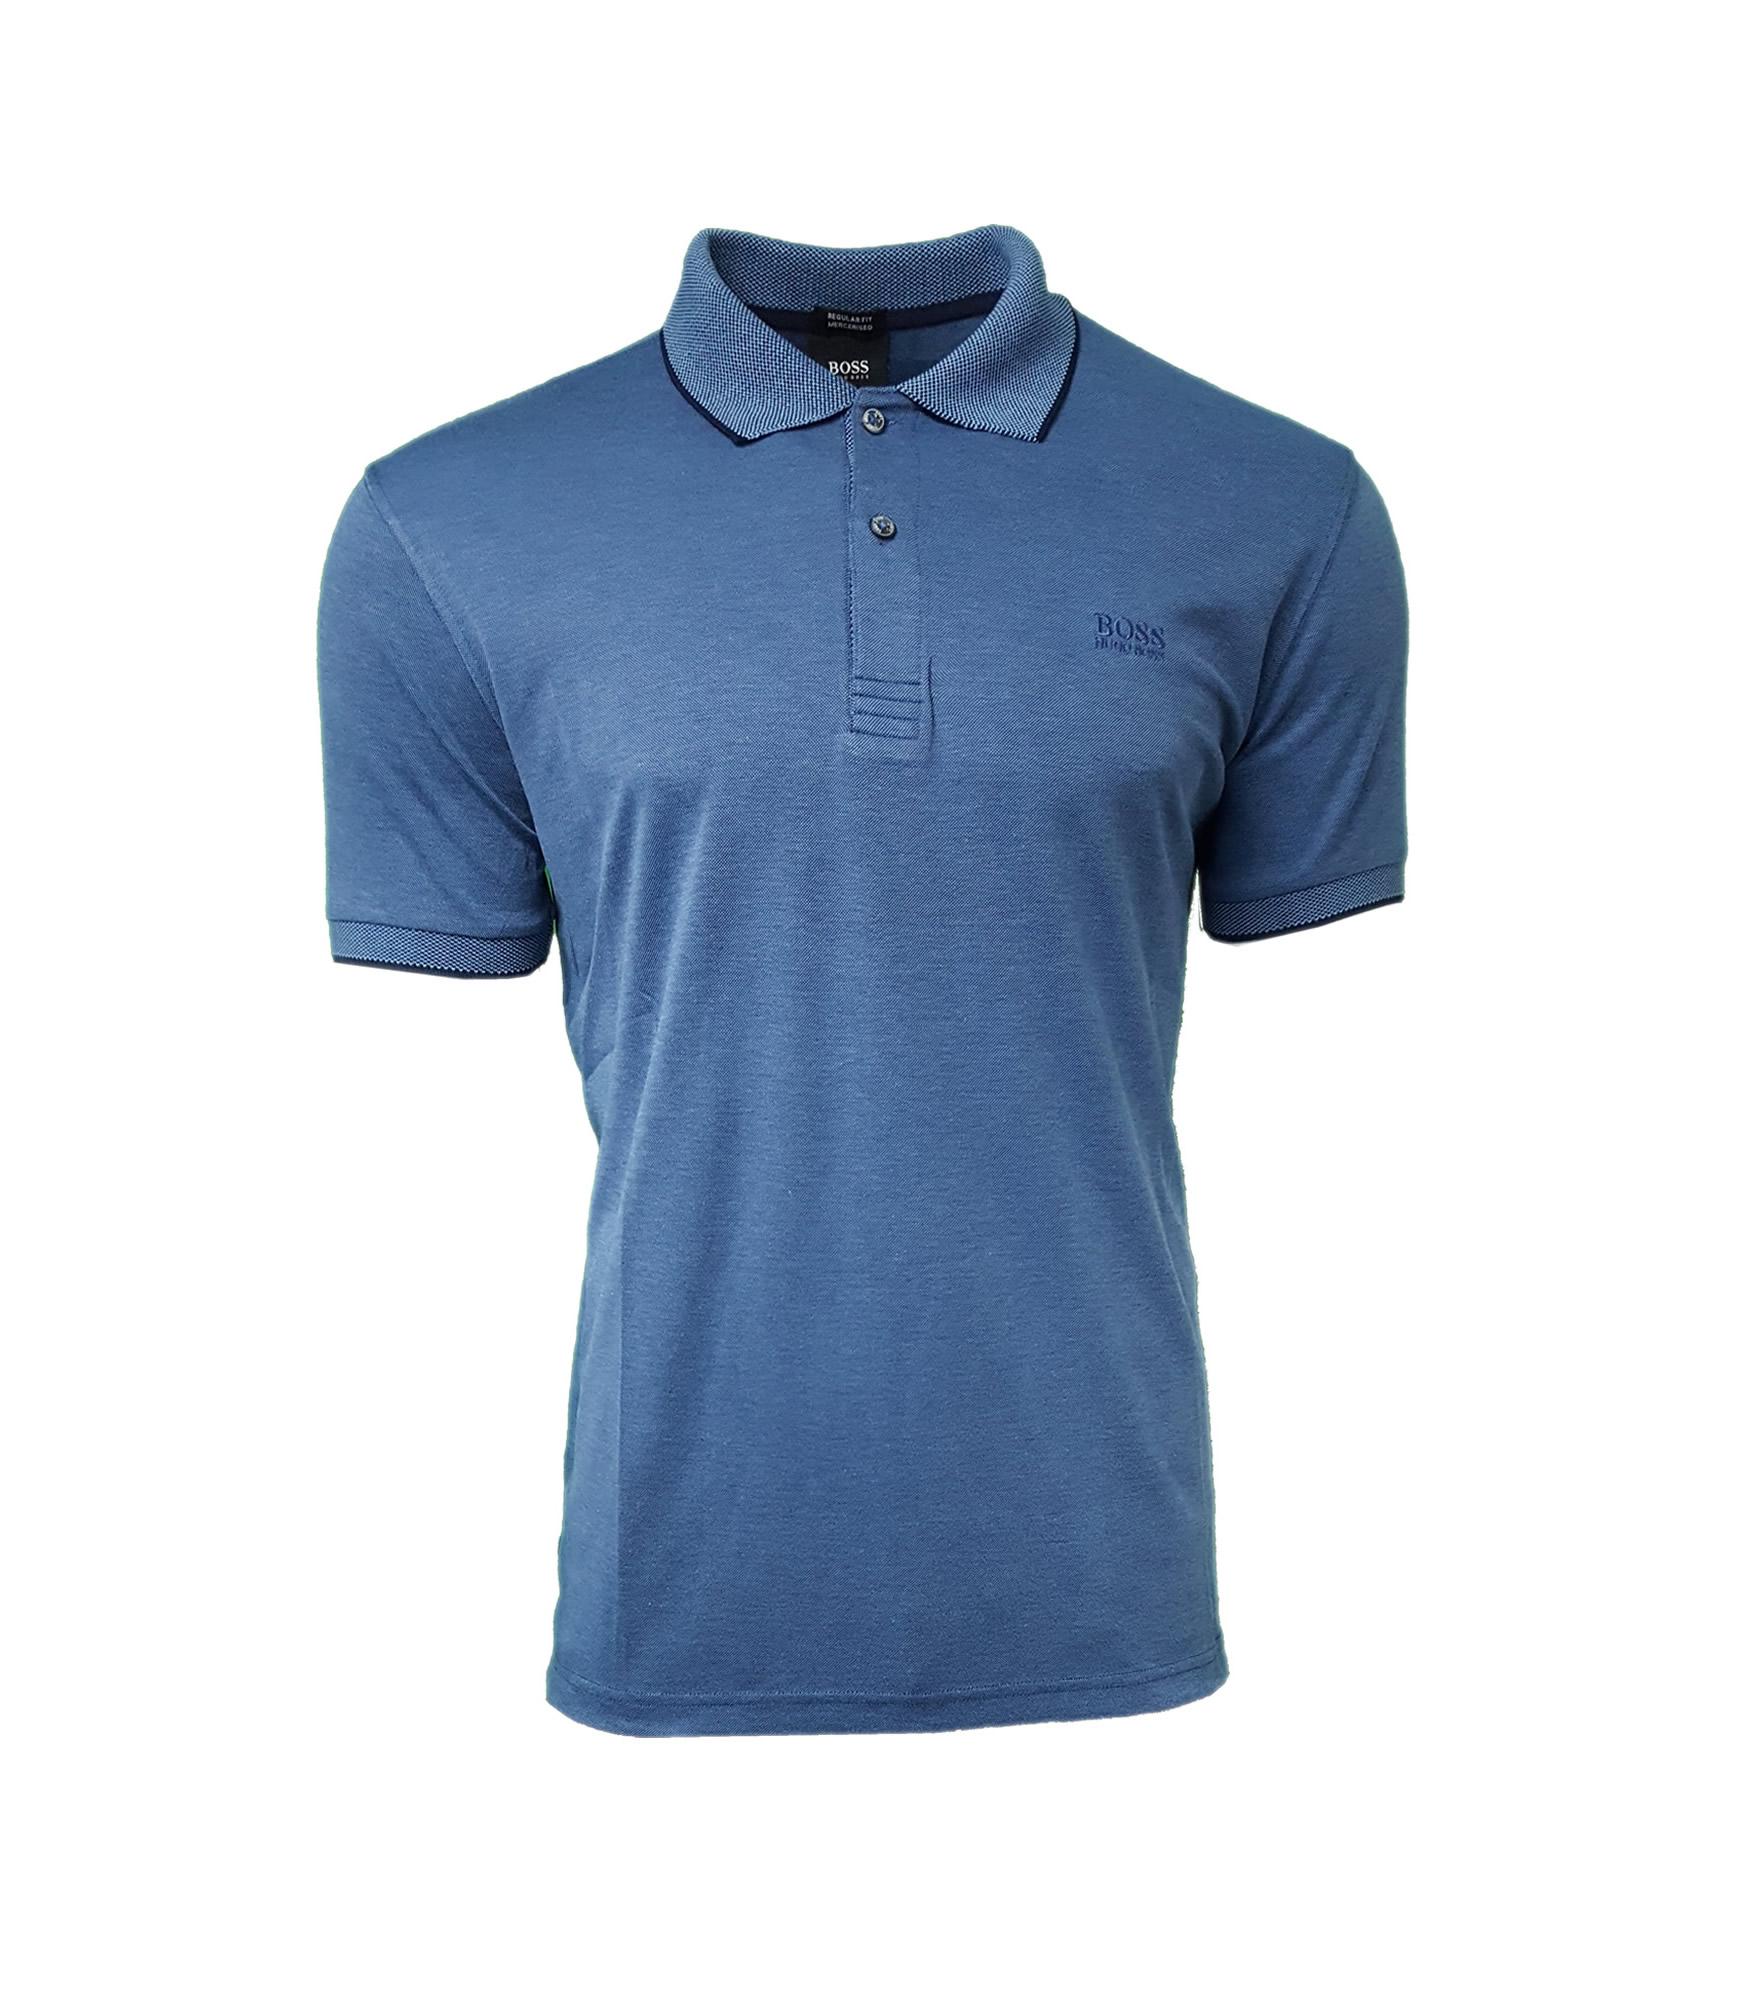 cff00adc8 Hugo Boss Men's Mercerised Polo Shirt. Short Sleeve. Chest Embroidered Logo  in Denim Blue | INTOTO7 Menswear